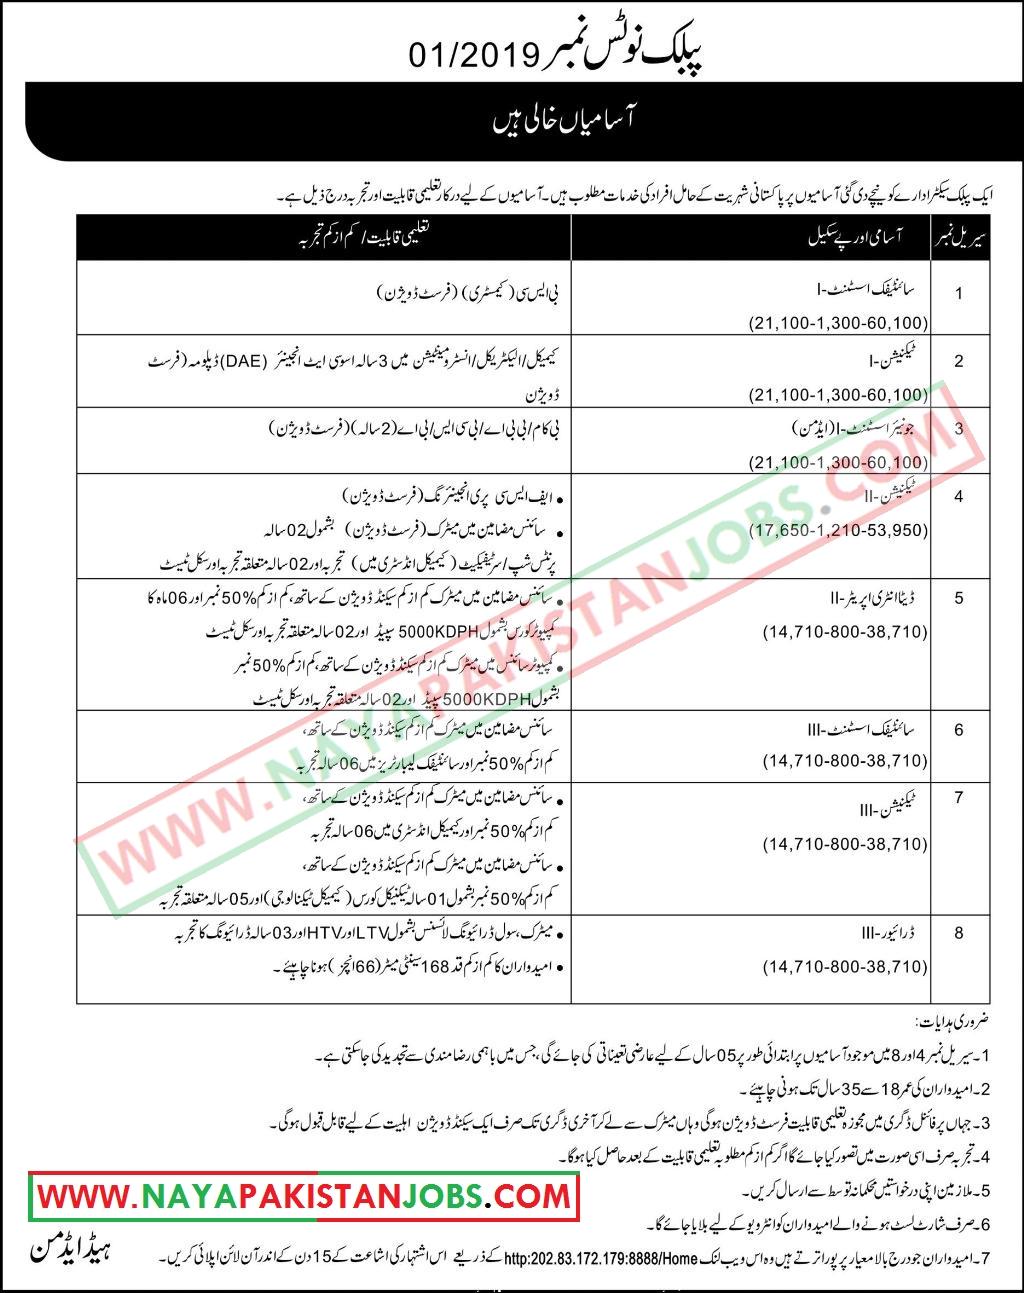 Public Sector Organization Jobs PAEC Jobs February 2019 | Pakistan Atomic Energy Latest Jobs